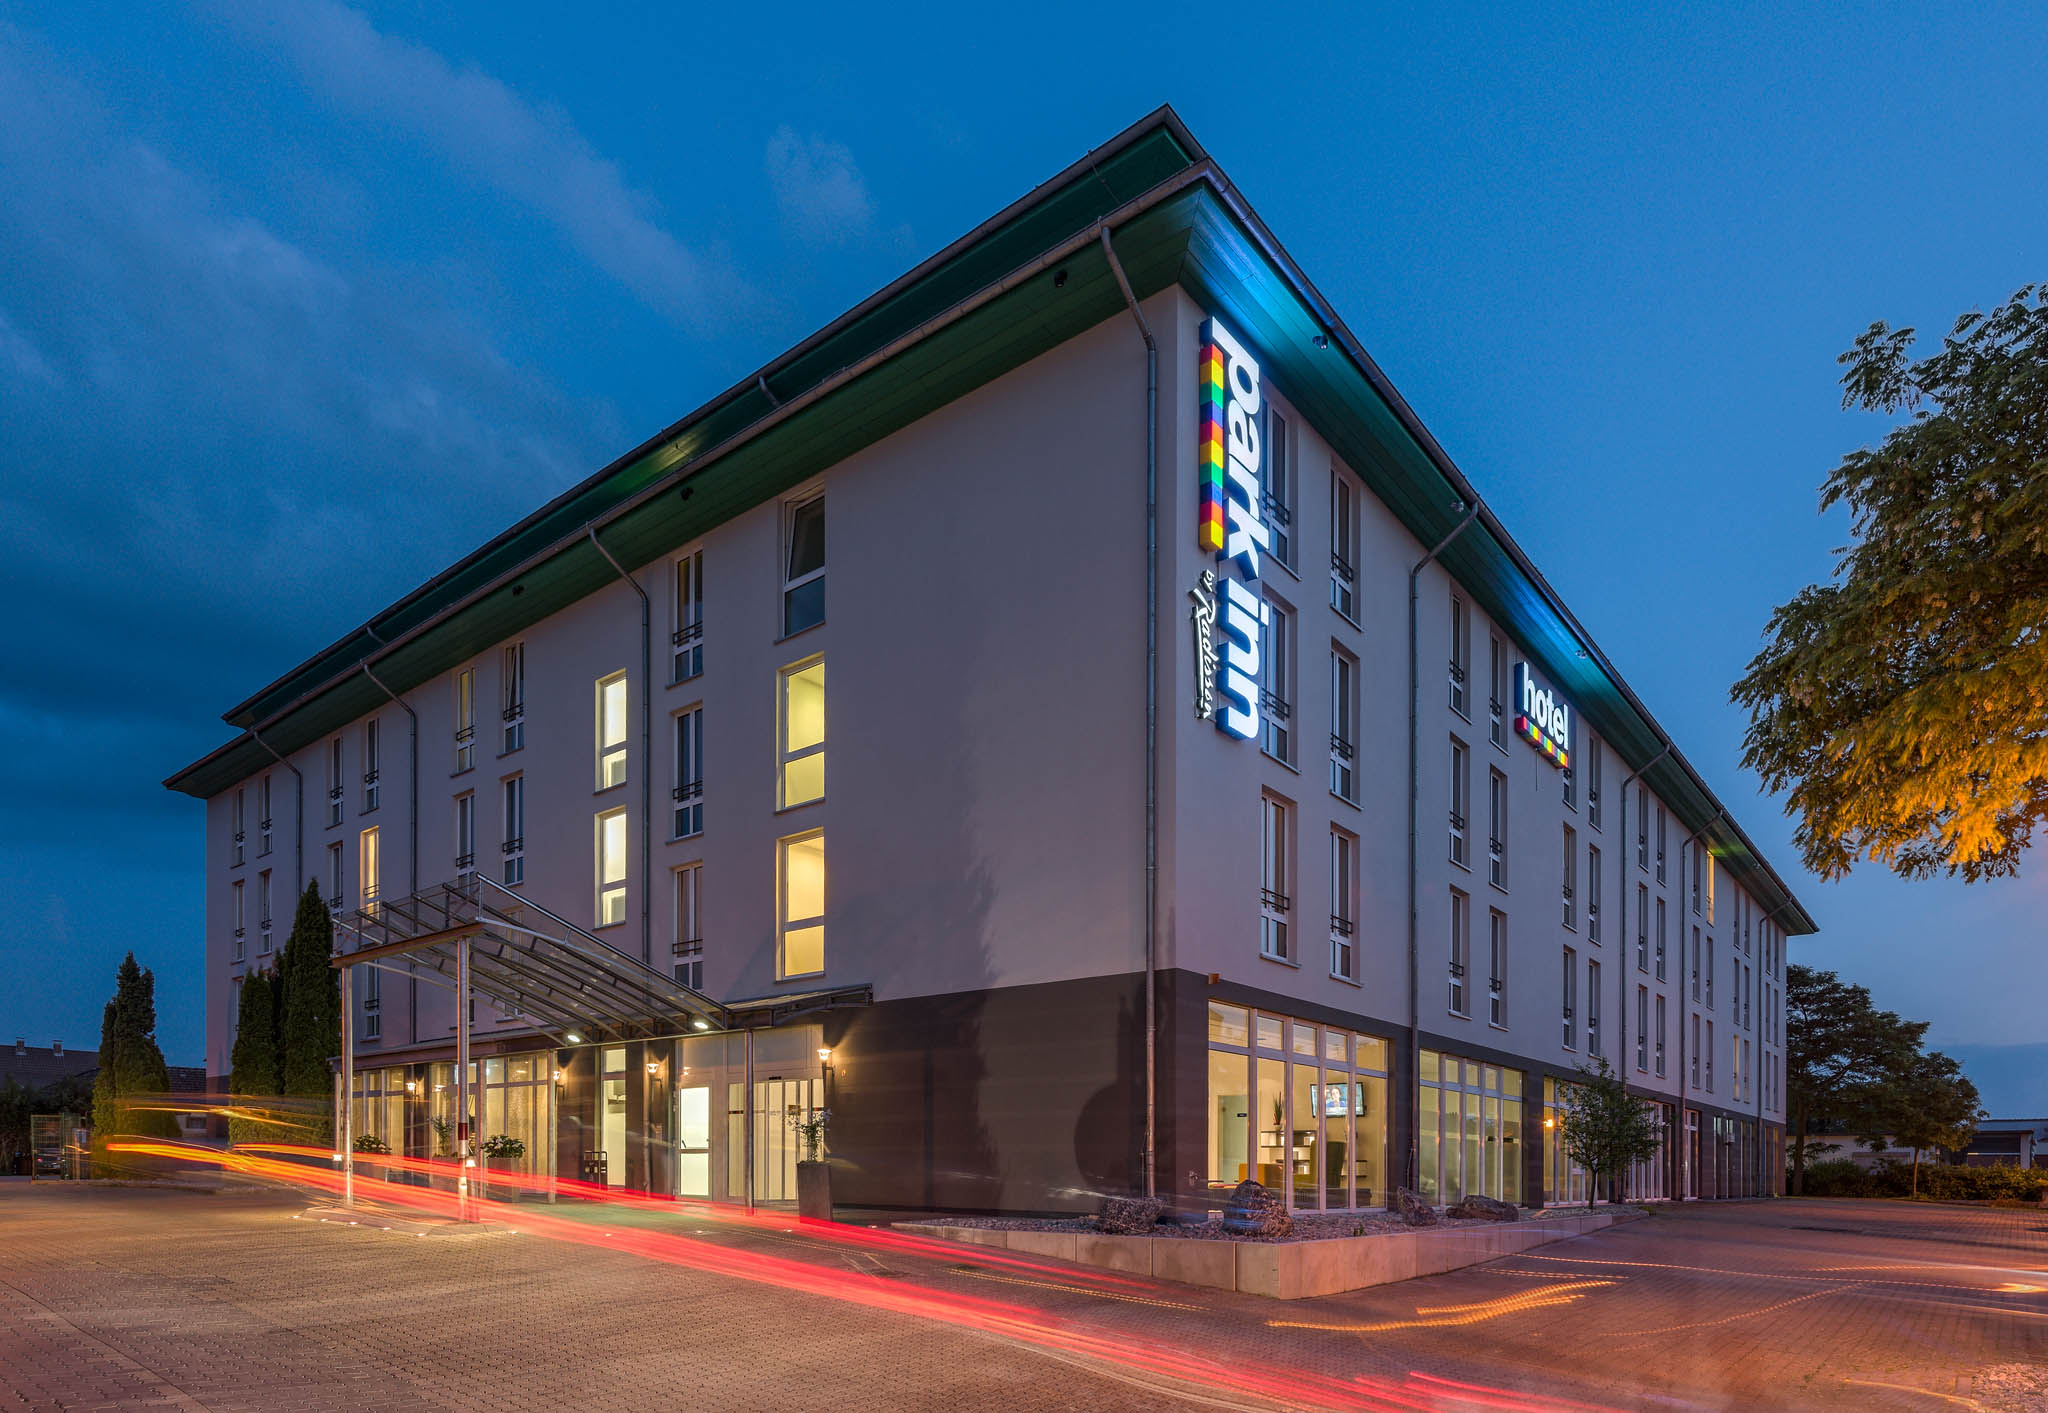 Park inn by radisson hotel g ttingen provent hotels gmbh for Hotels in gottingen und umgebung